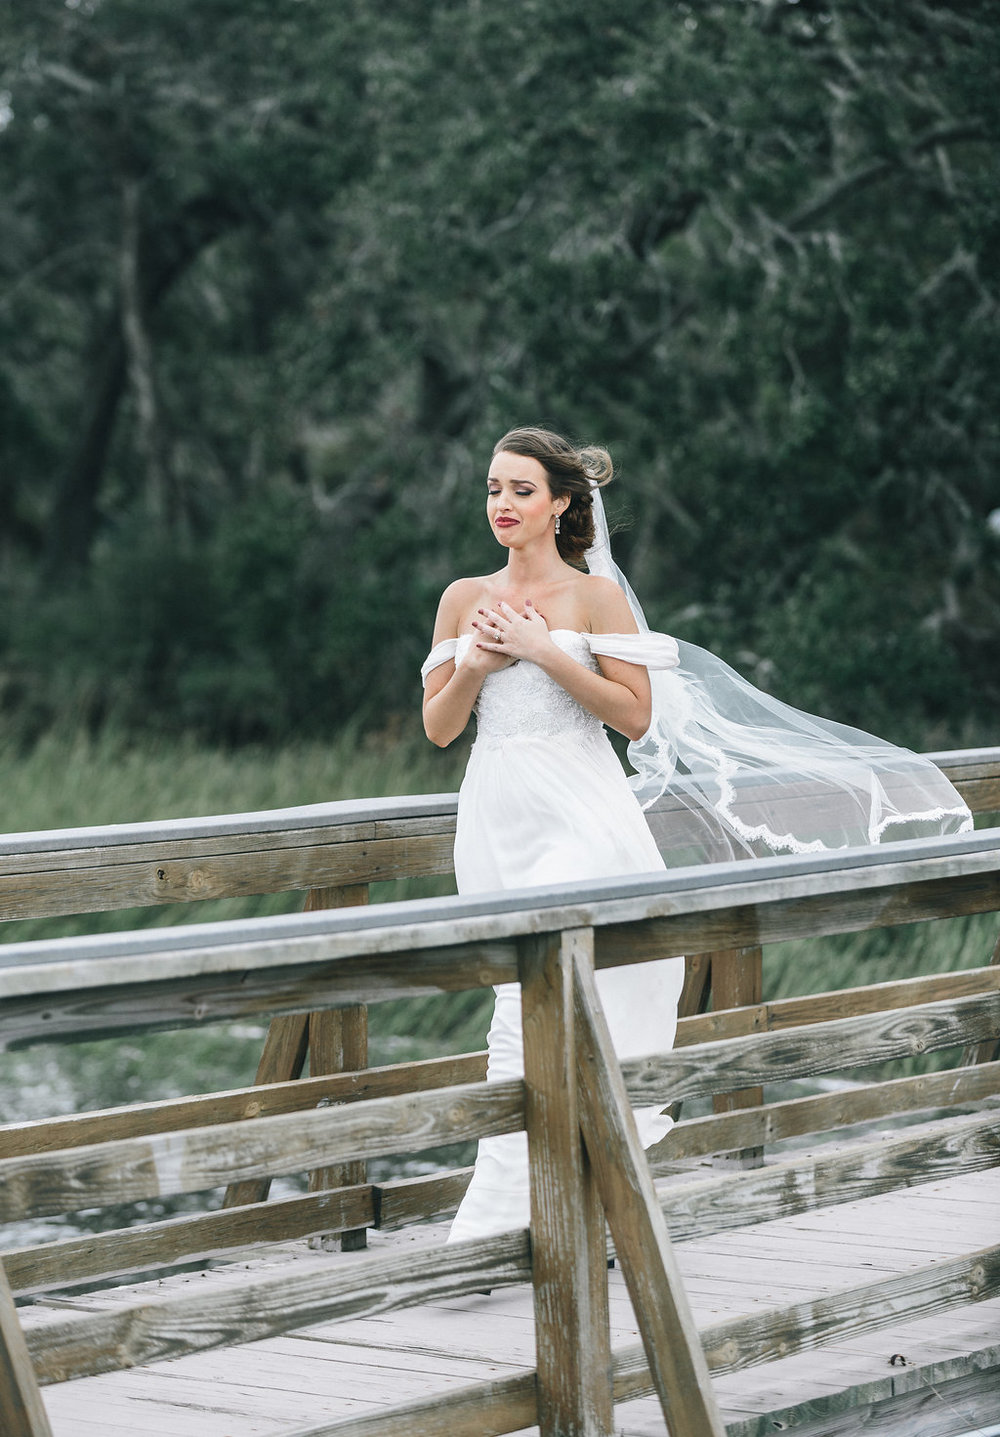 savannah-bridal-shop-i-and-b-couple-tim-and-amy-boho-marshland-wedding-in-savannah-mackensey-alexander-photography-10.jpg